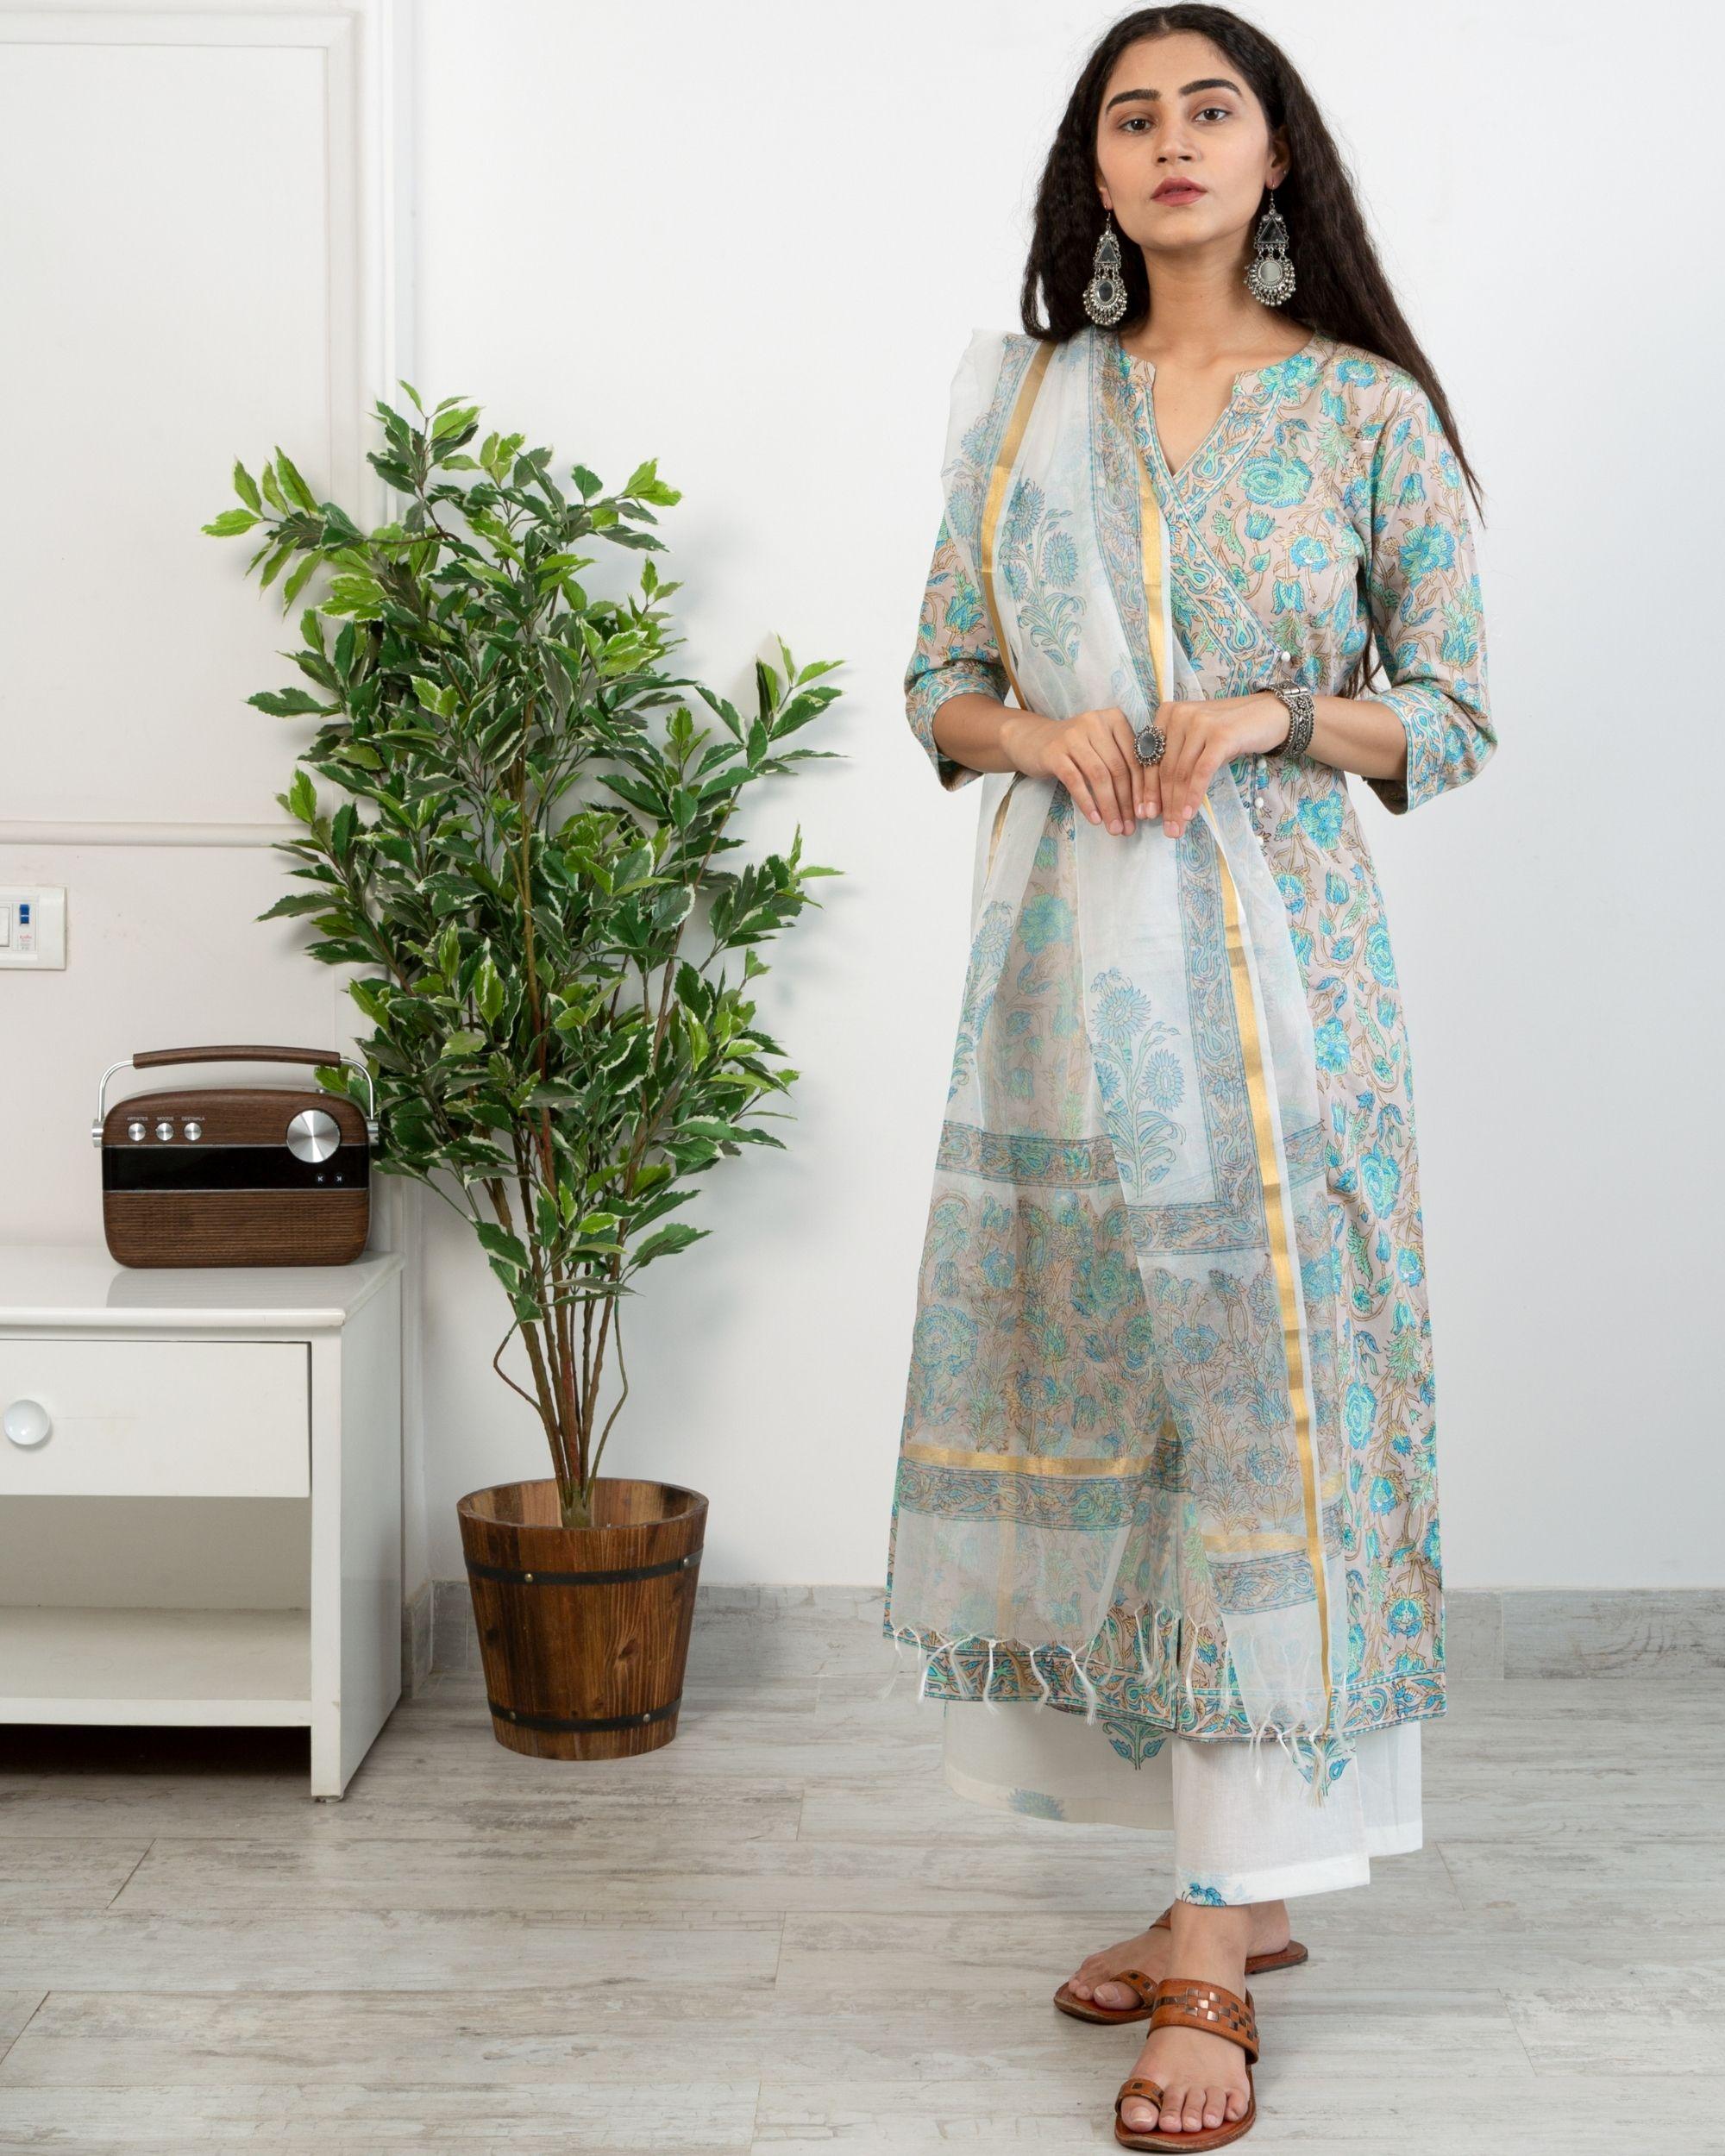 Pastel blue floral anghrakha kurta and white printed pants with chanderi handblock printed dupatta - set of three